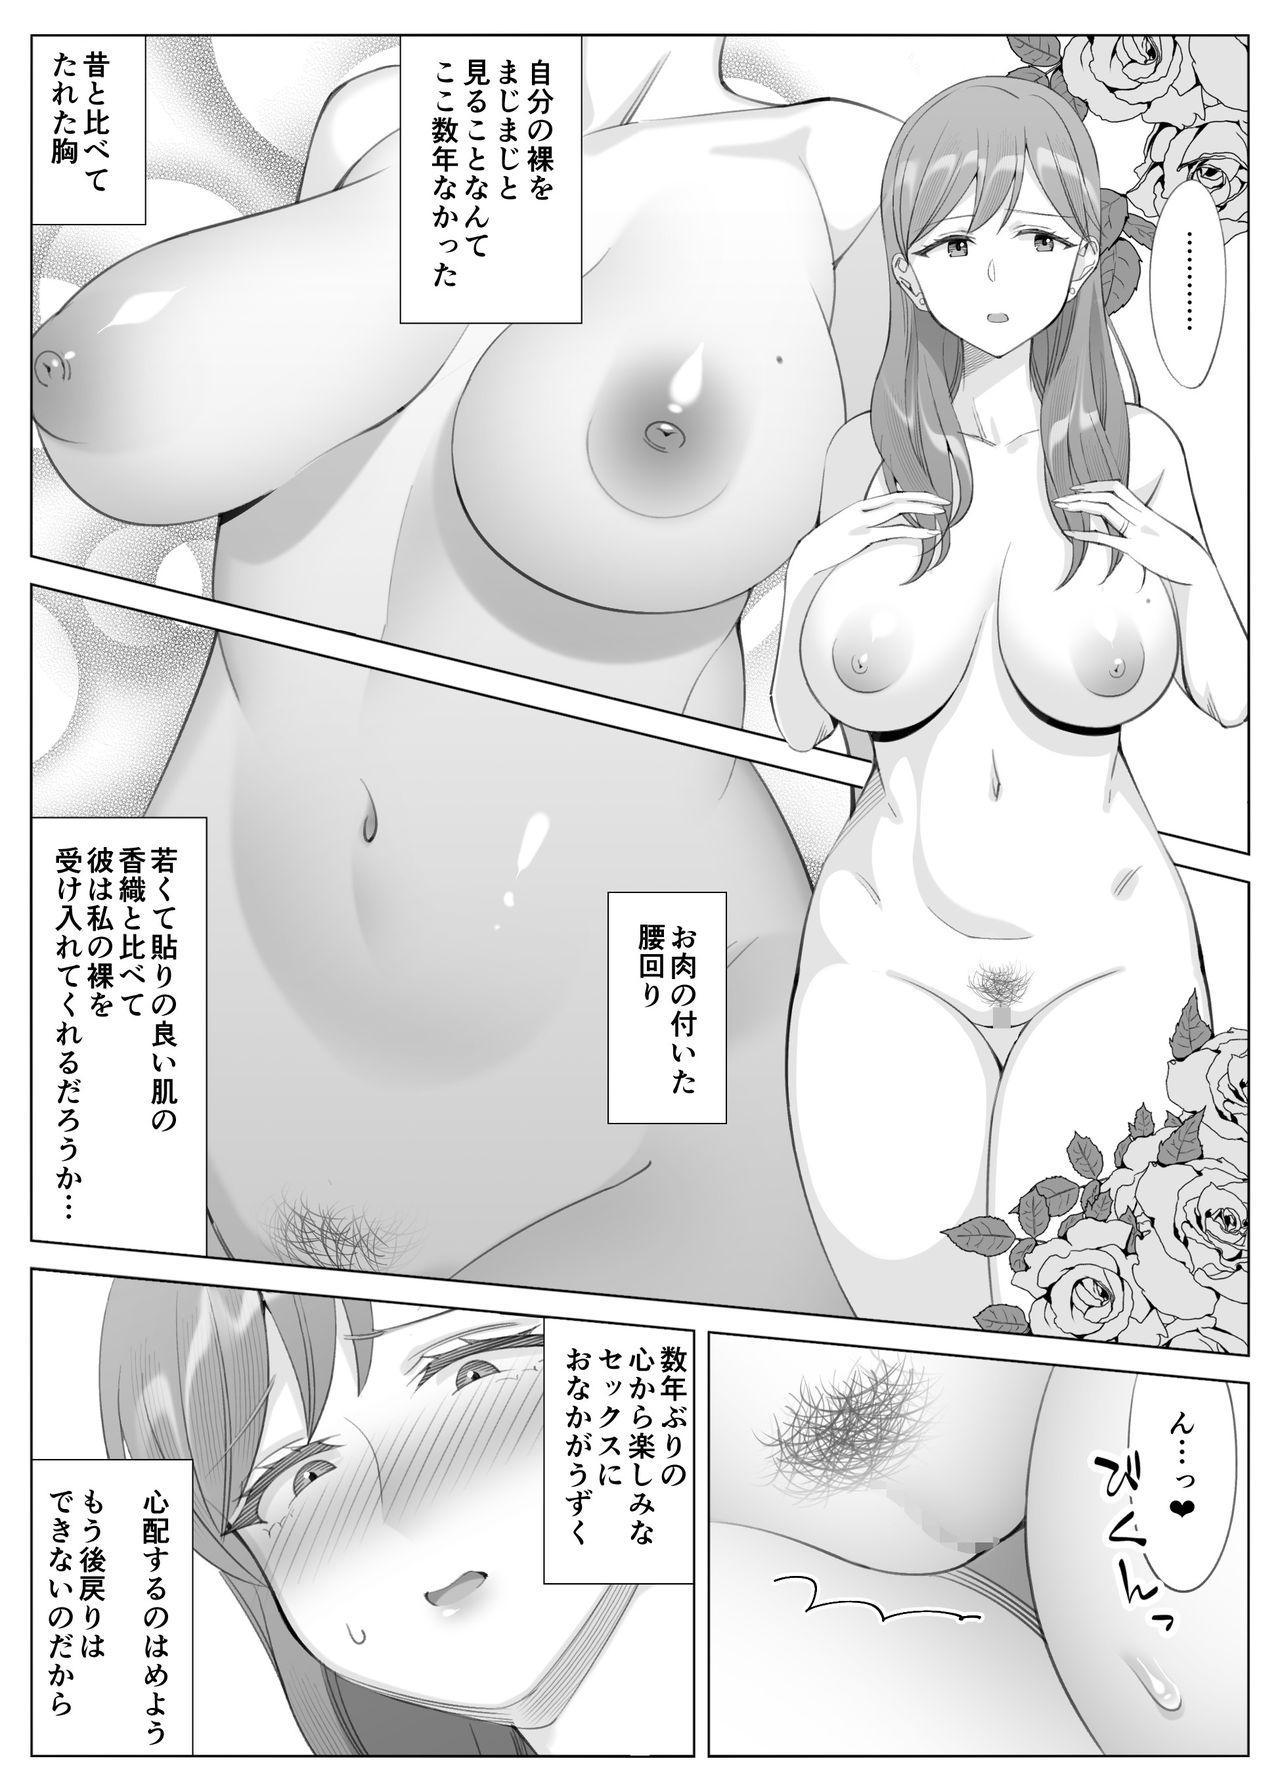 Hanamisaki no Inran na Hansei 52